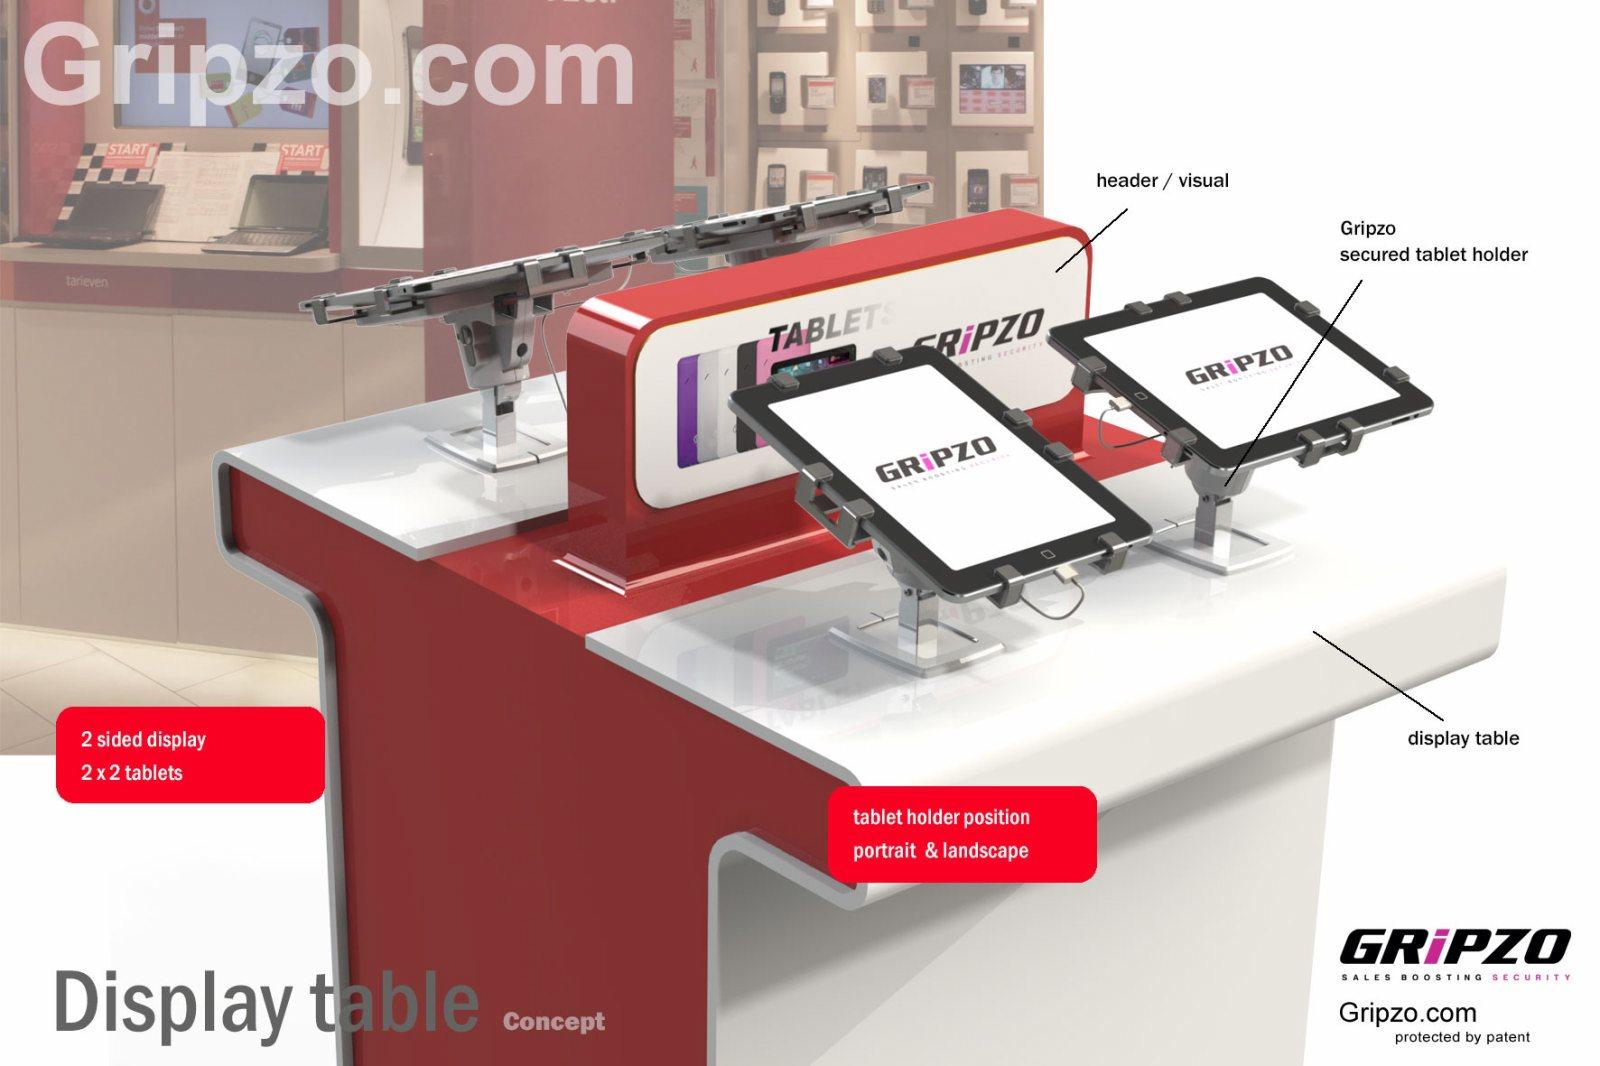 gripzo-gorilla-grip-anti-theft-protection-in-retail-stores.jpg